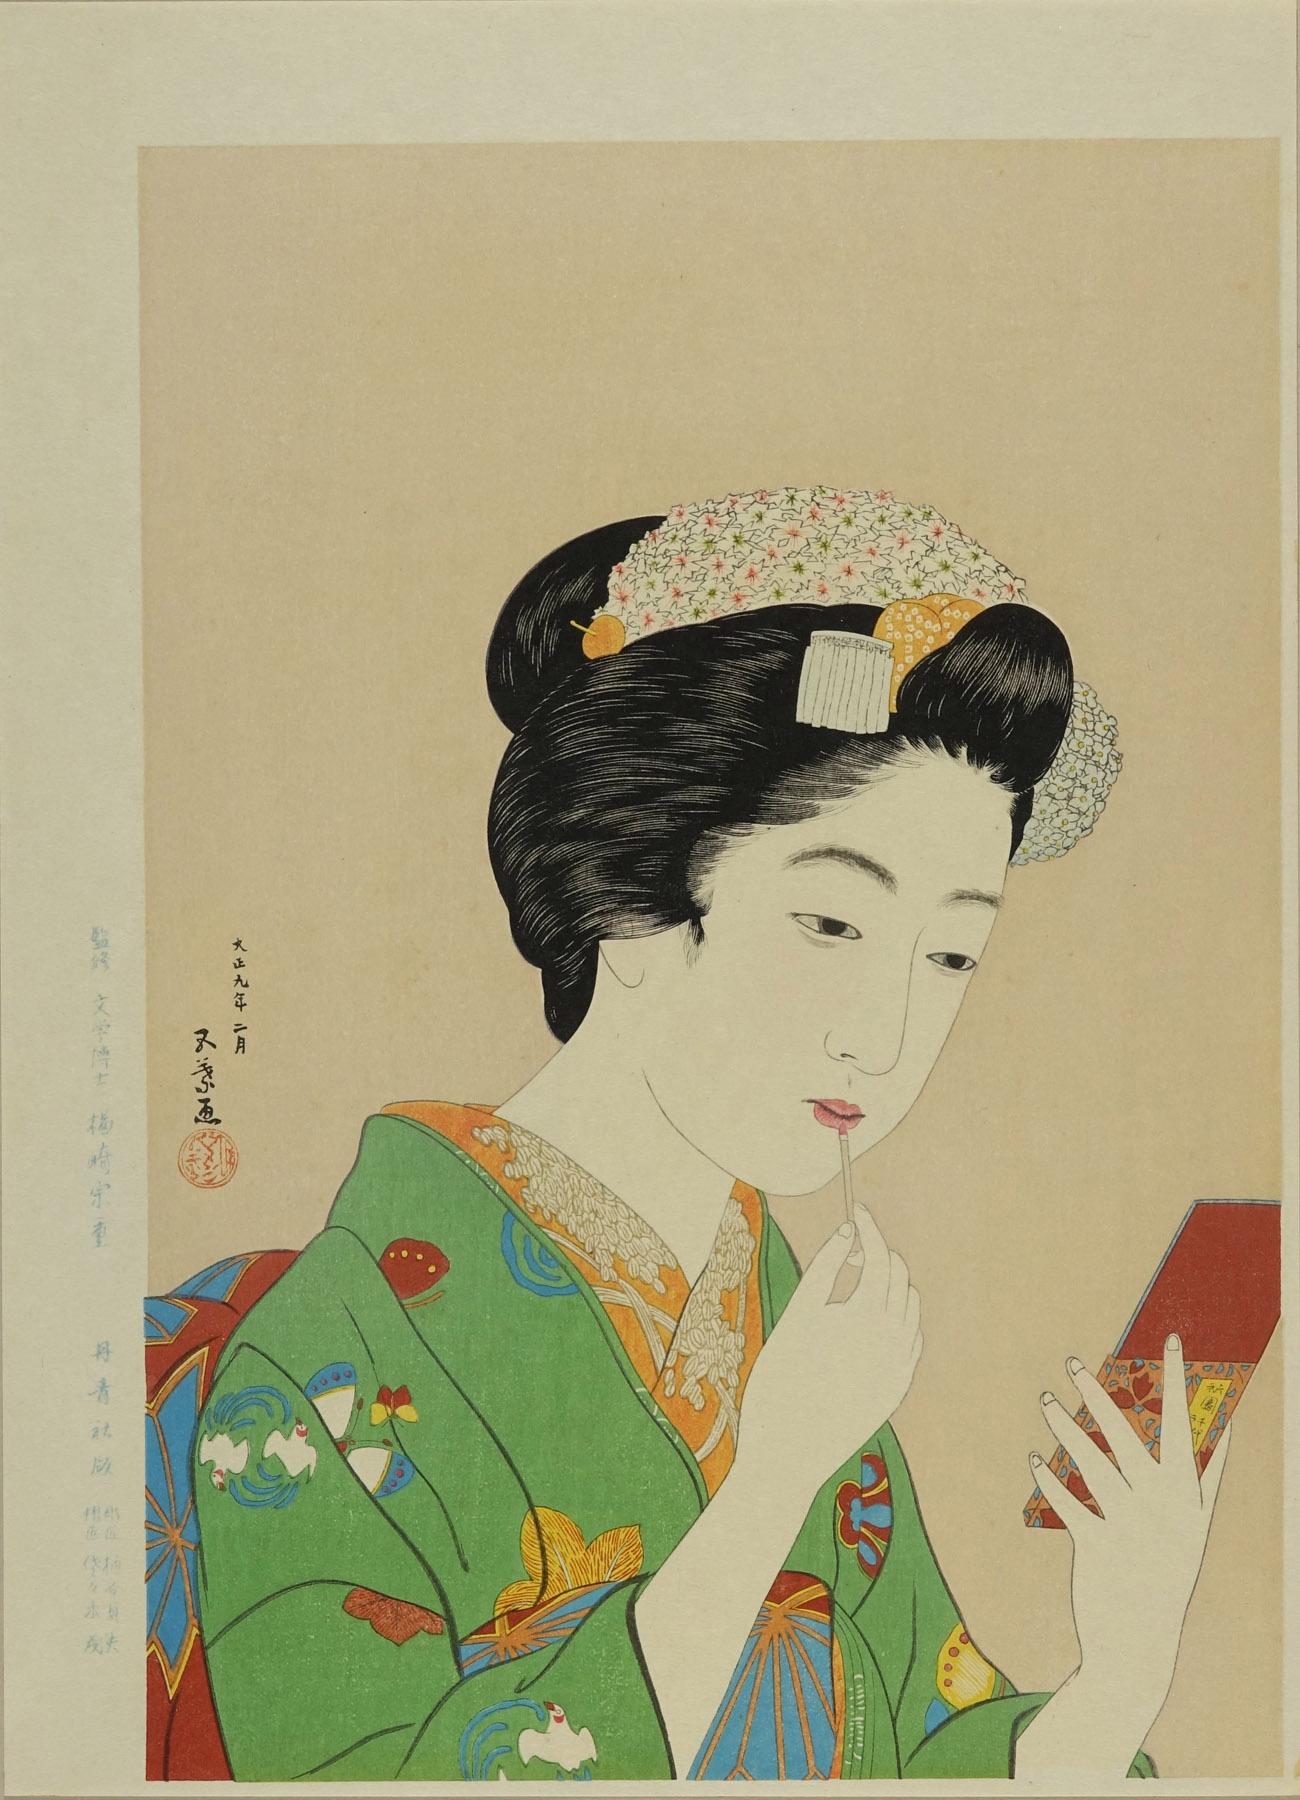 HASHIGUCHI GOYO Girl holding lipstick, titked Kyo maiko: after Hashiguchi Goyo, hand-printed woodcut reproduction, published by Tanseisha, 42.5x31cm., matted